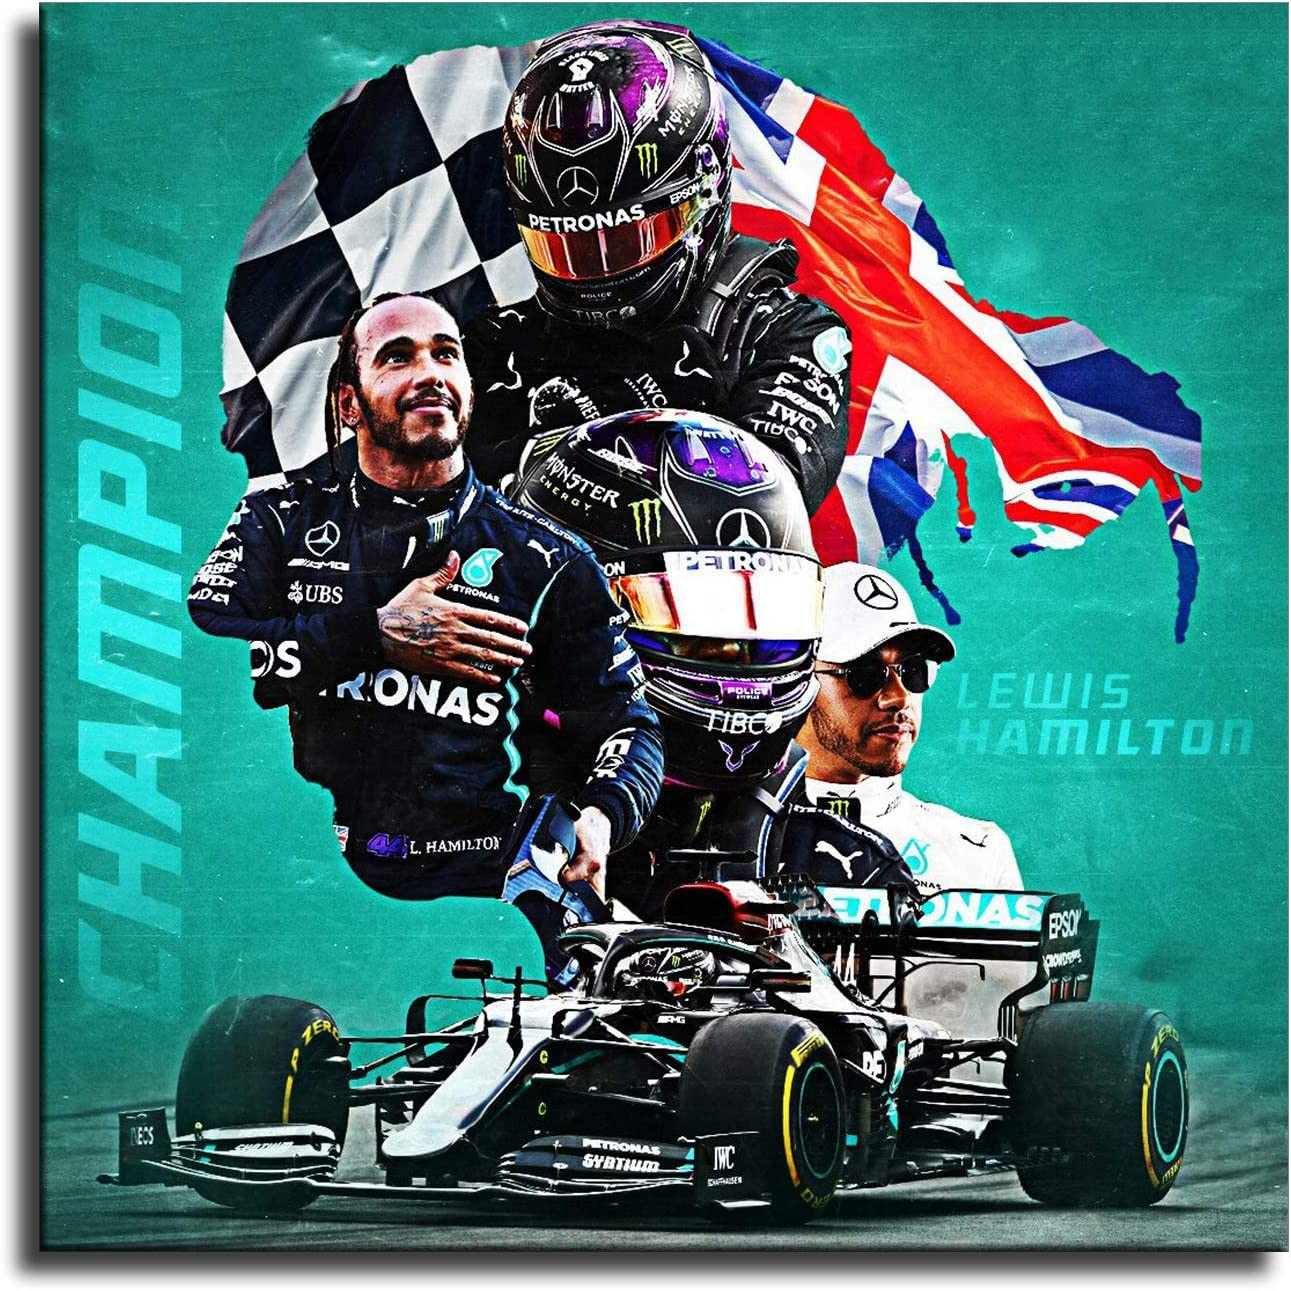 Details about  /Formula 1 Lewis Hamilton 7x World Champion Racing Poster for 2020 Art Print